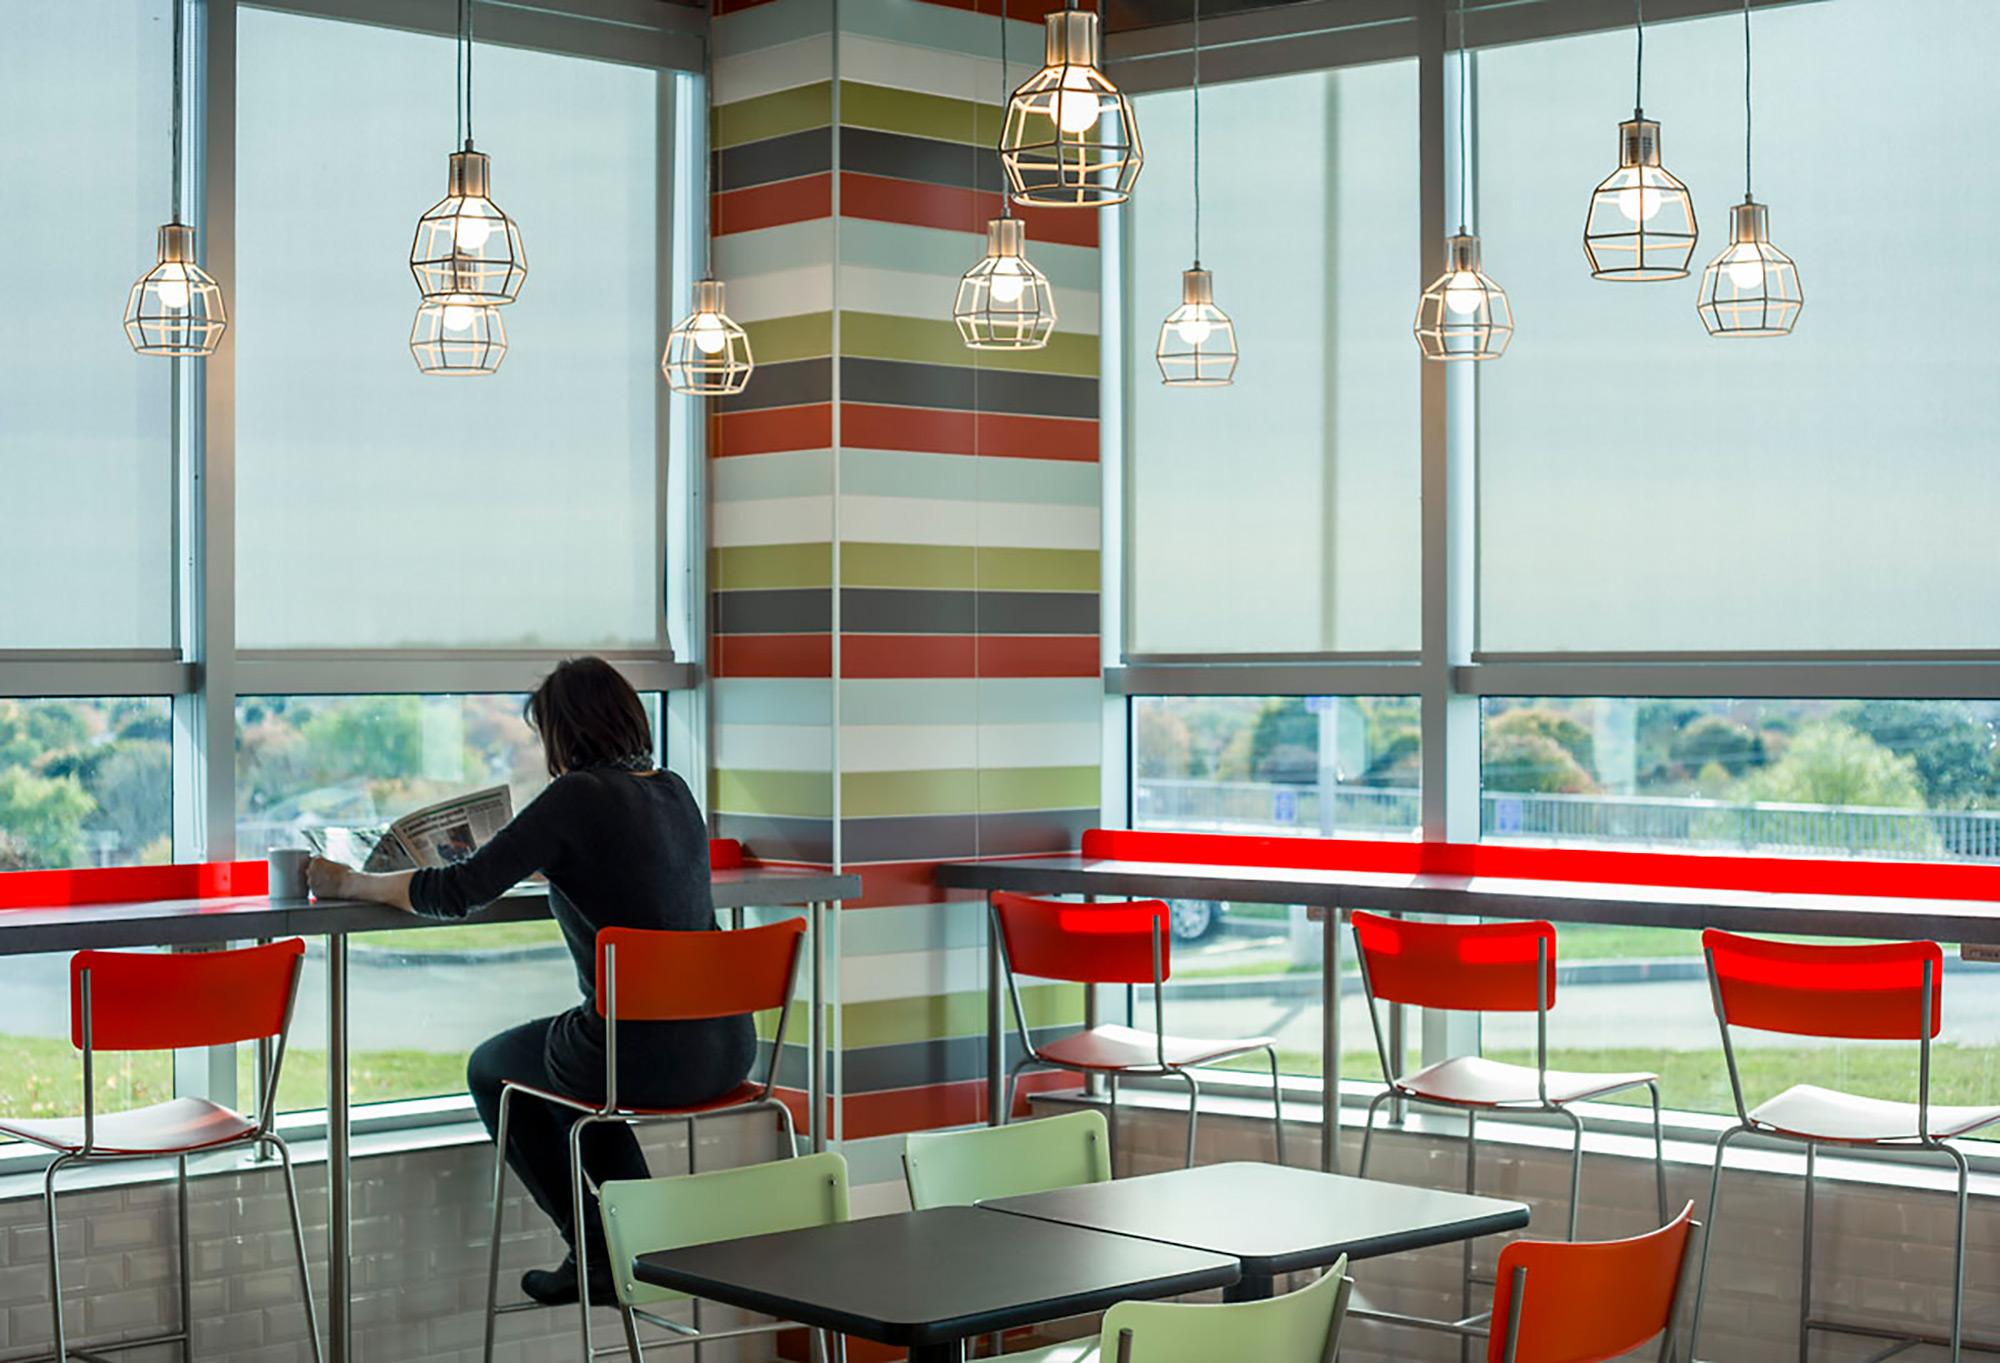 interior-design-cafe-seating.jpg